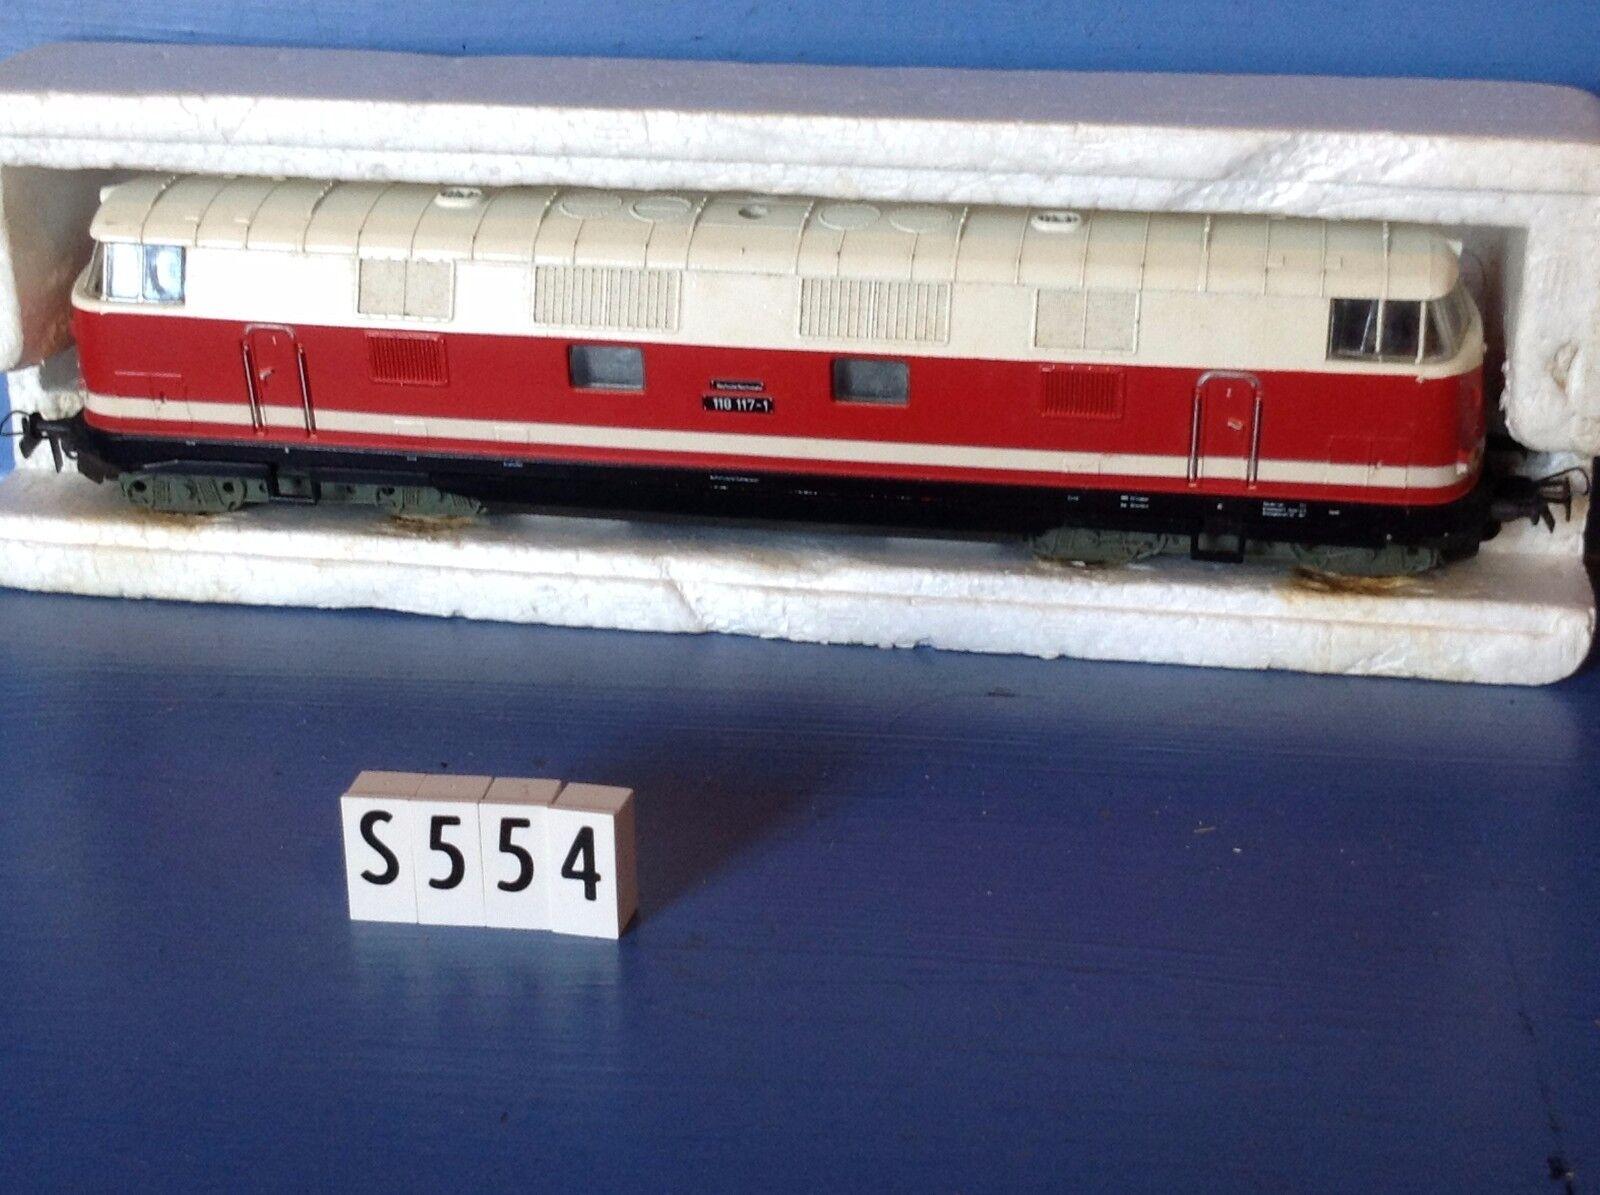 S554  locomotive GUTZOLD 118117-1 Piko - Fleishmann Jouef, ech : Ho